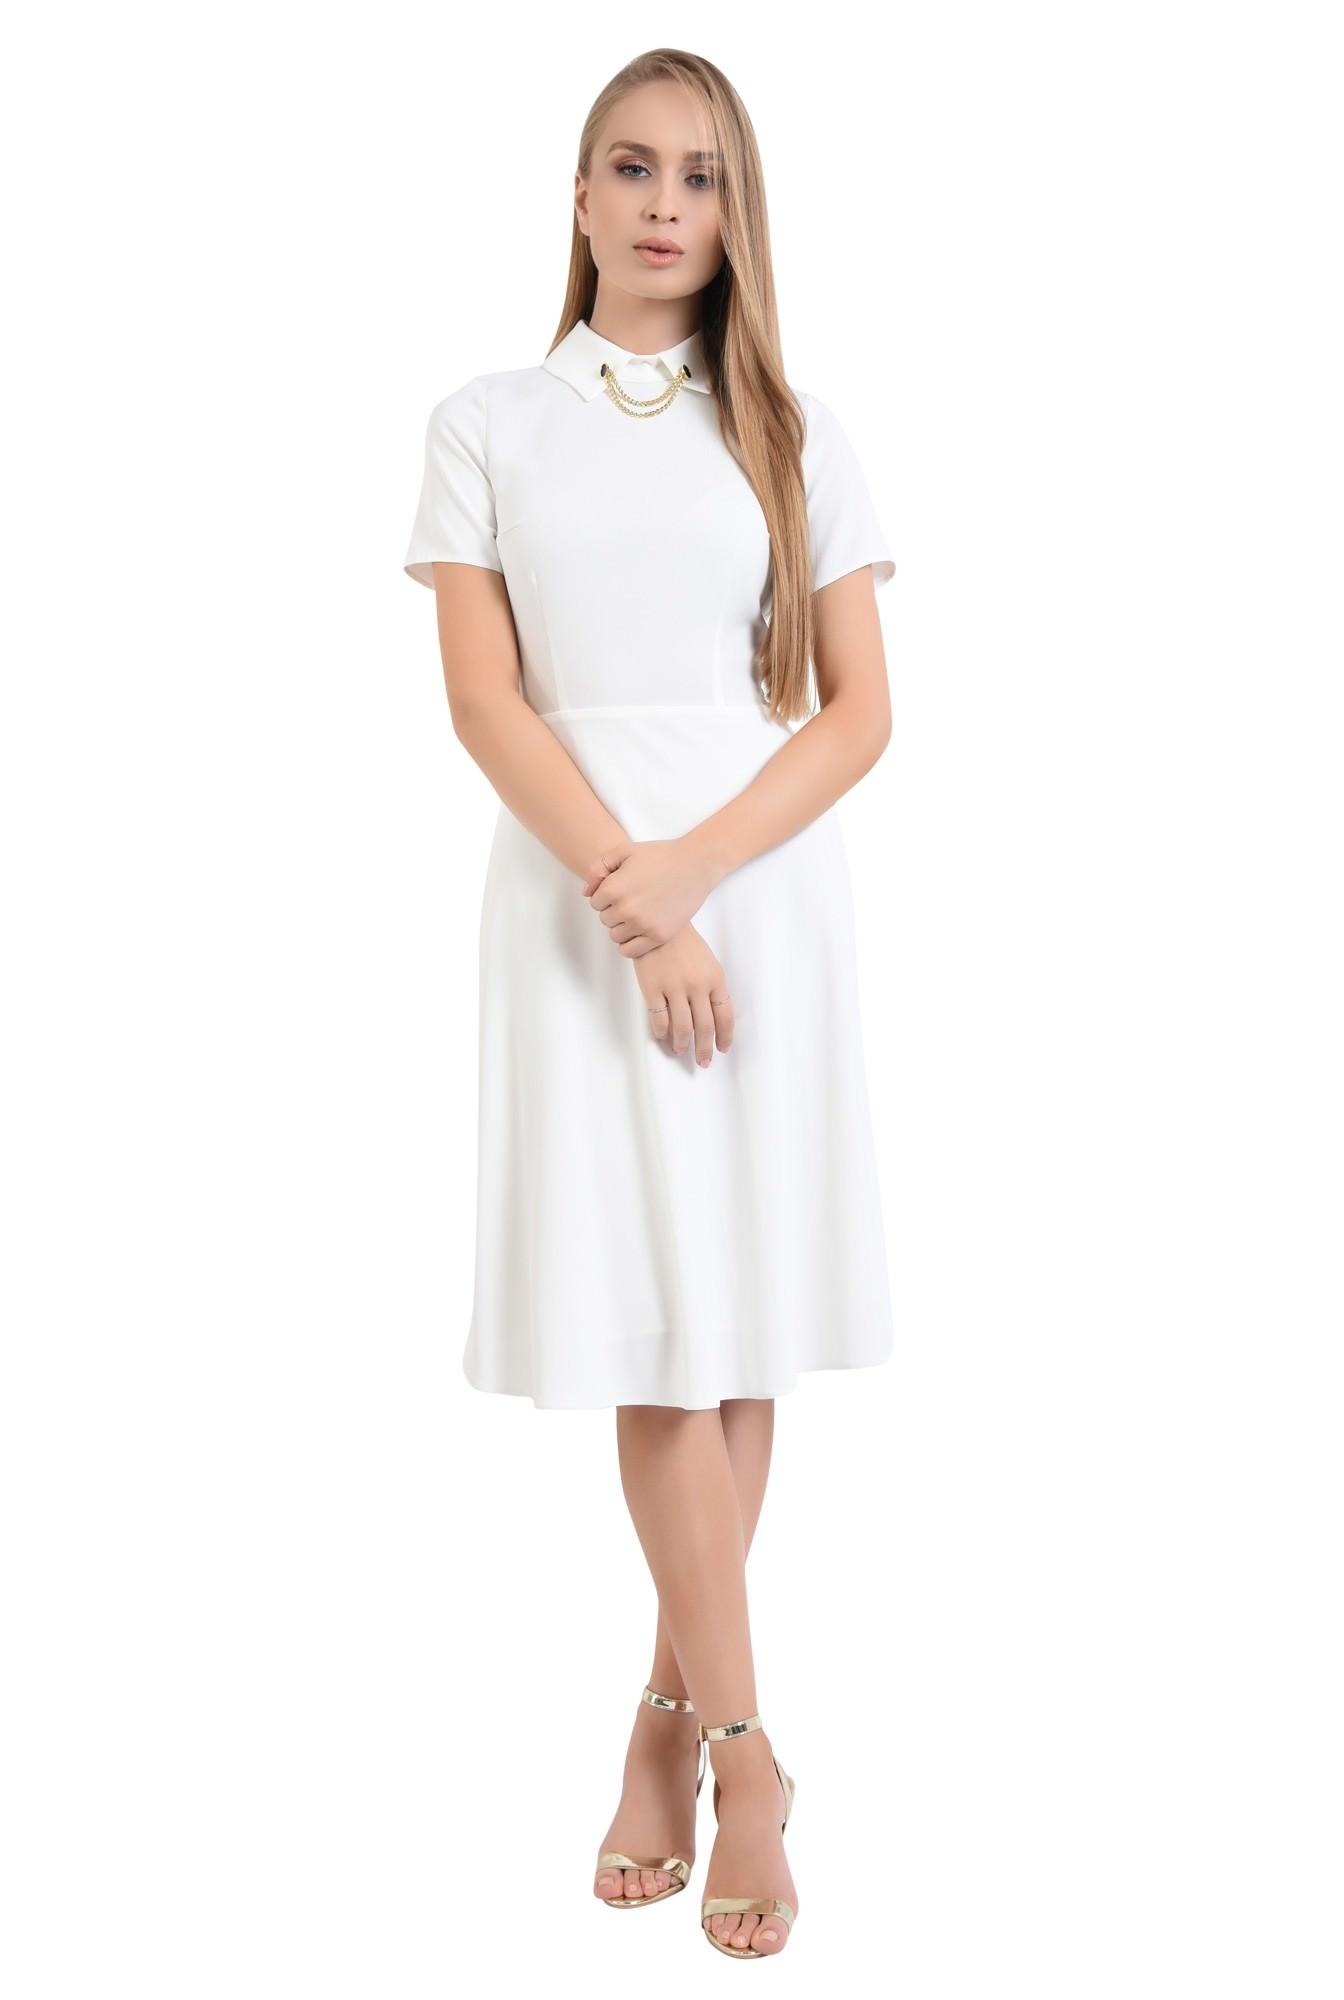 360 - rochie alba eleganta, bie, lungime medie